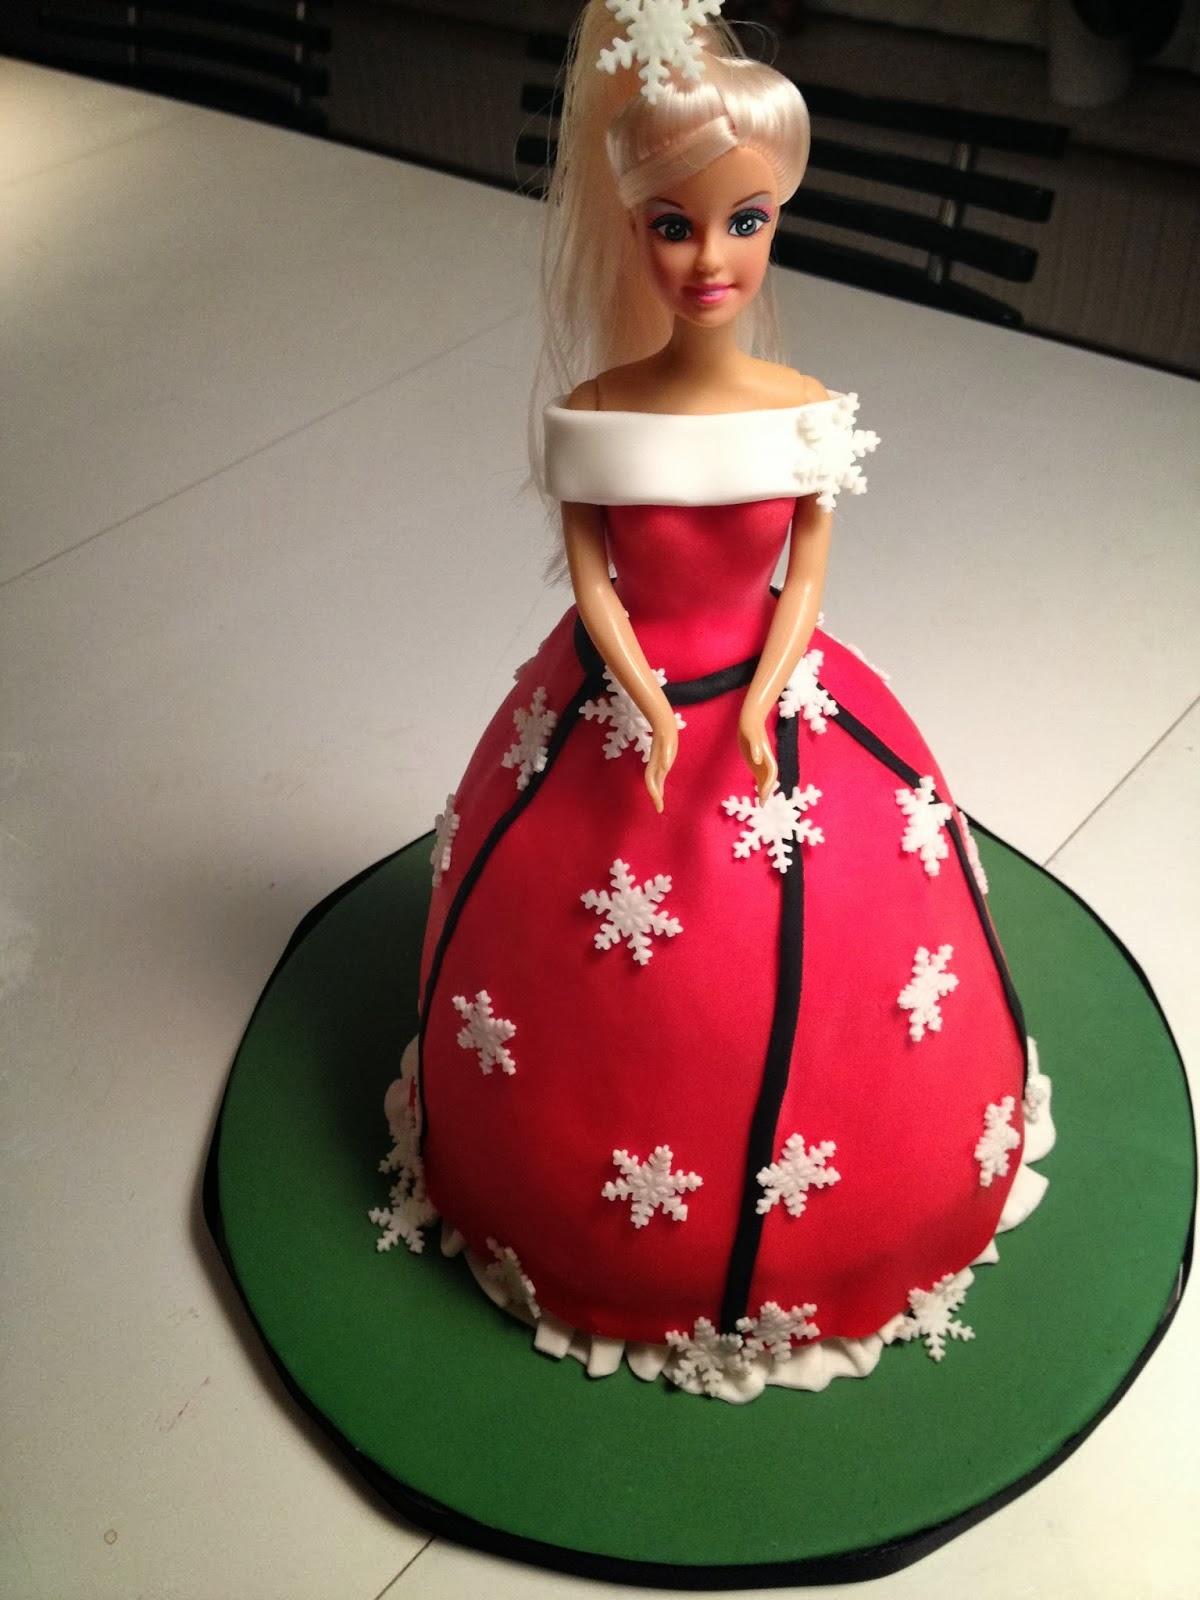 himmelske kager chokoladekage